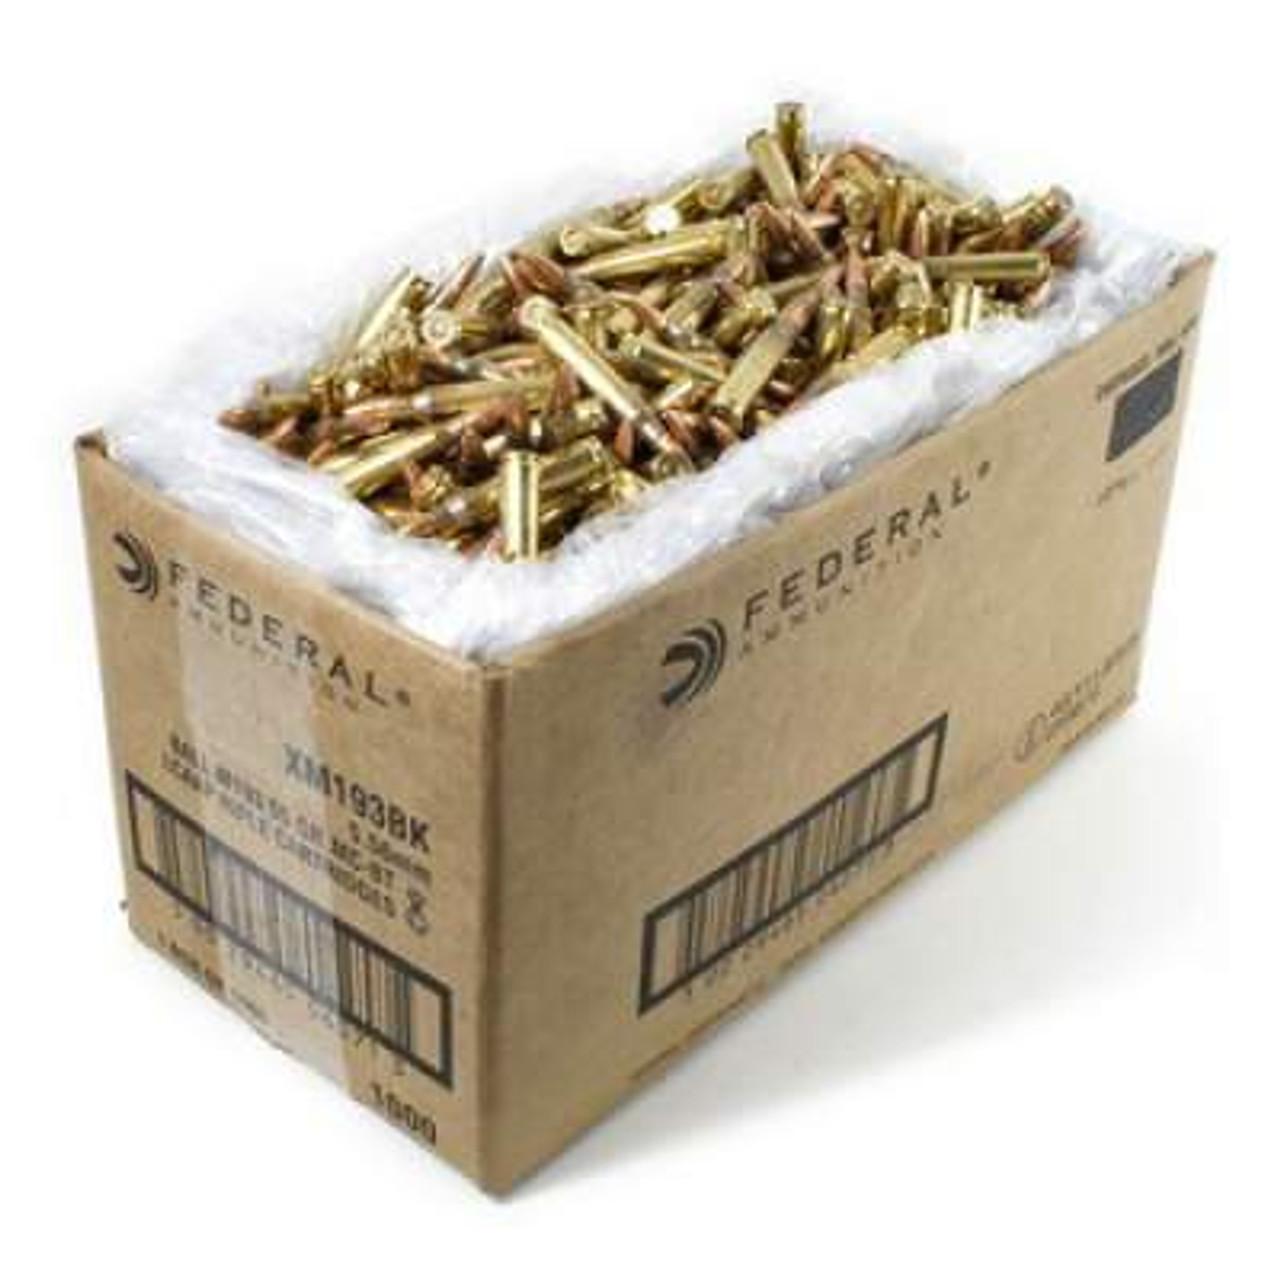 Federal 5 56x45mm NATO Ammunition XM193BK 55 gr FMJ Bulk 1000 rounds